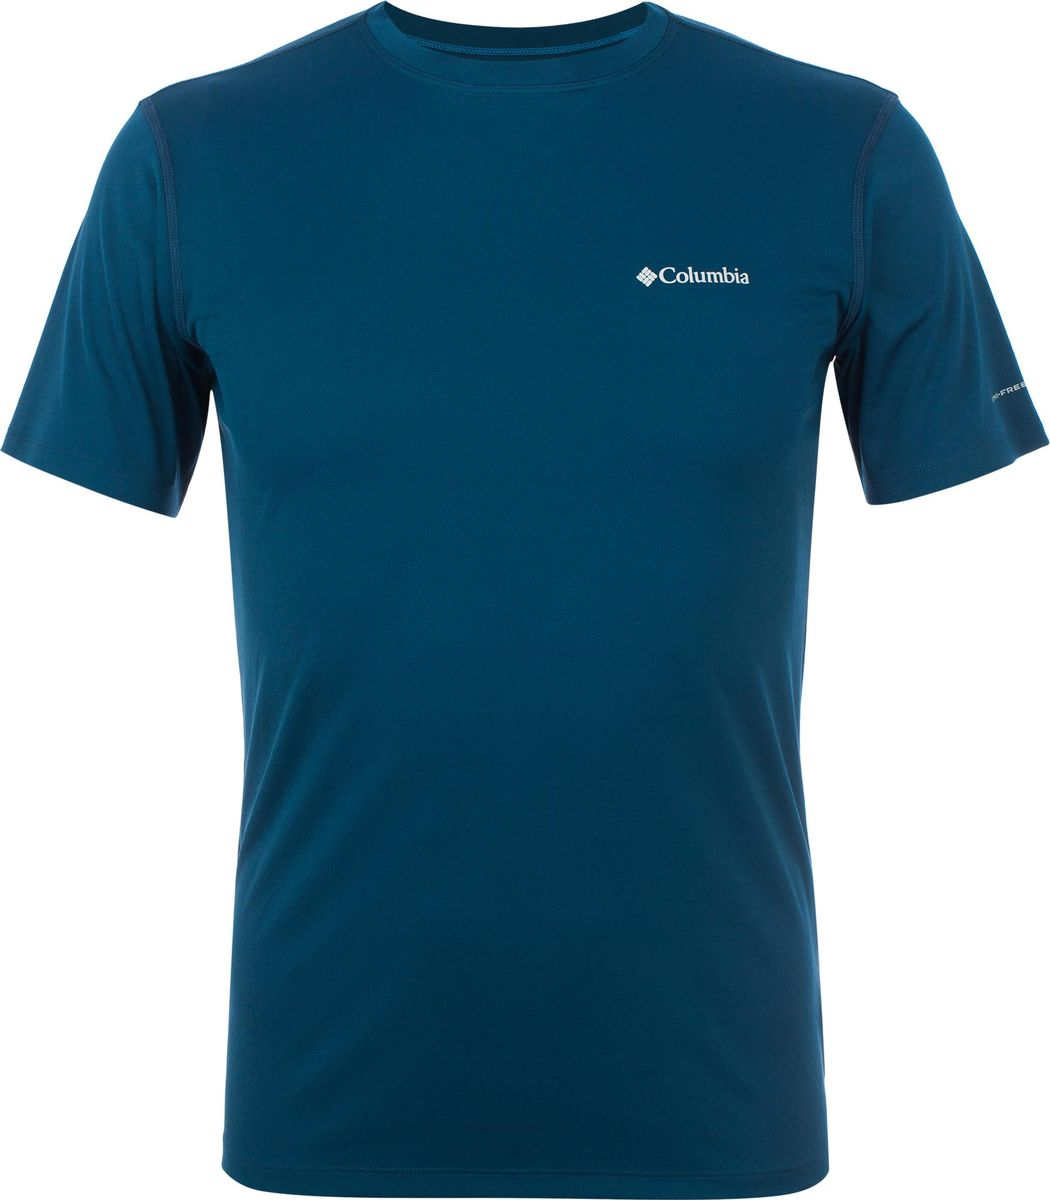 Футболка Columbia Zero Rules Short Sleeve Shirt рубашка мужская columbia katchor ii short sleeve shirt цвет голубой 1577778 440 размер xl 52 54